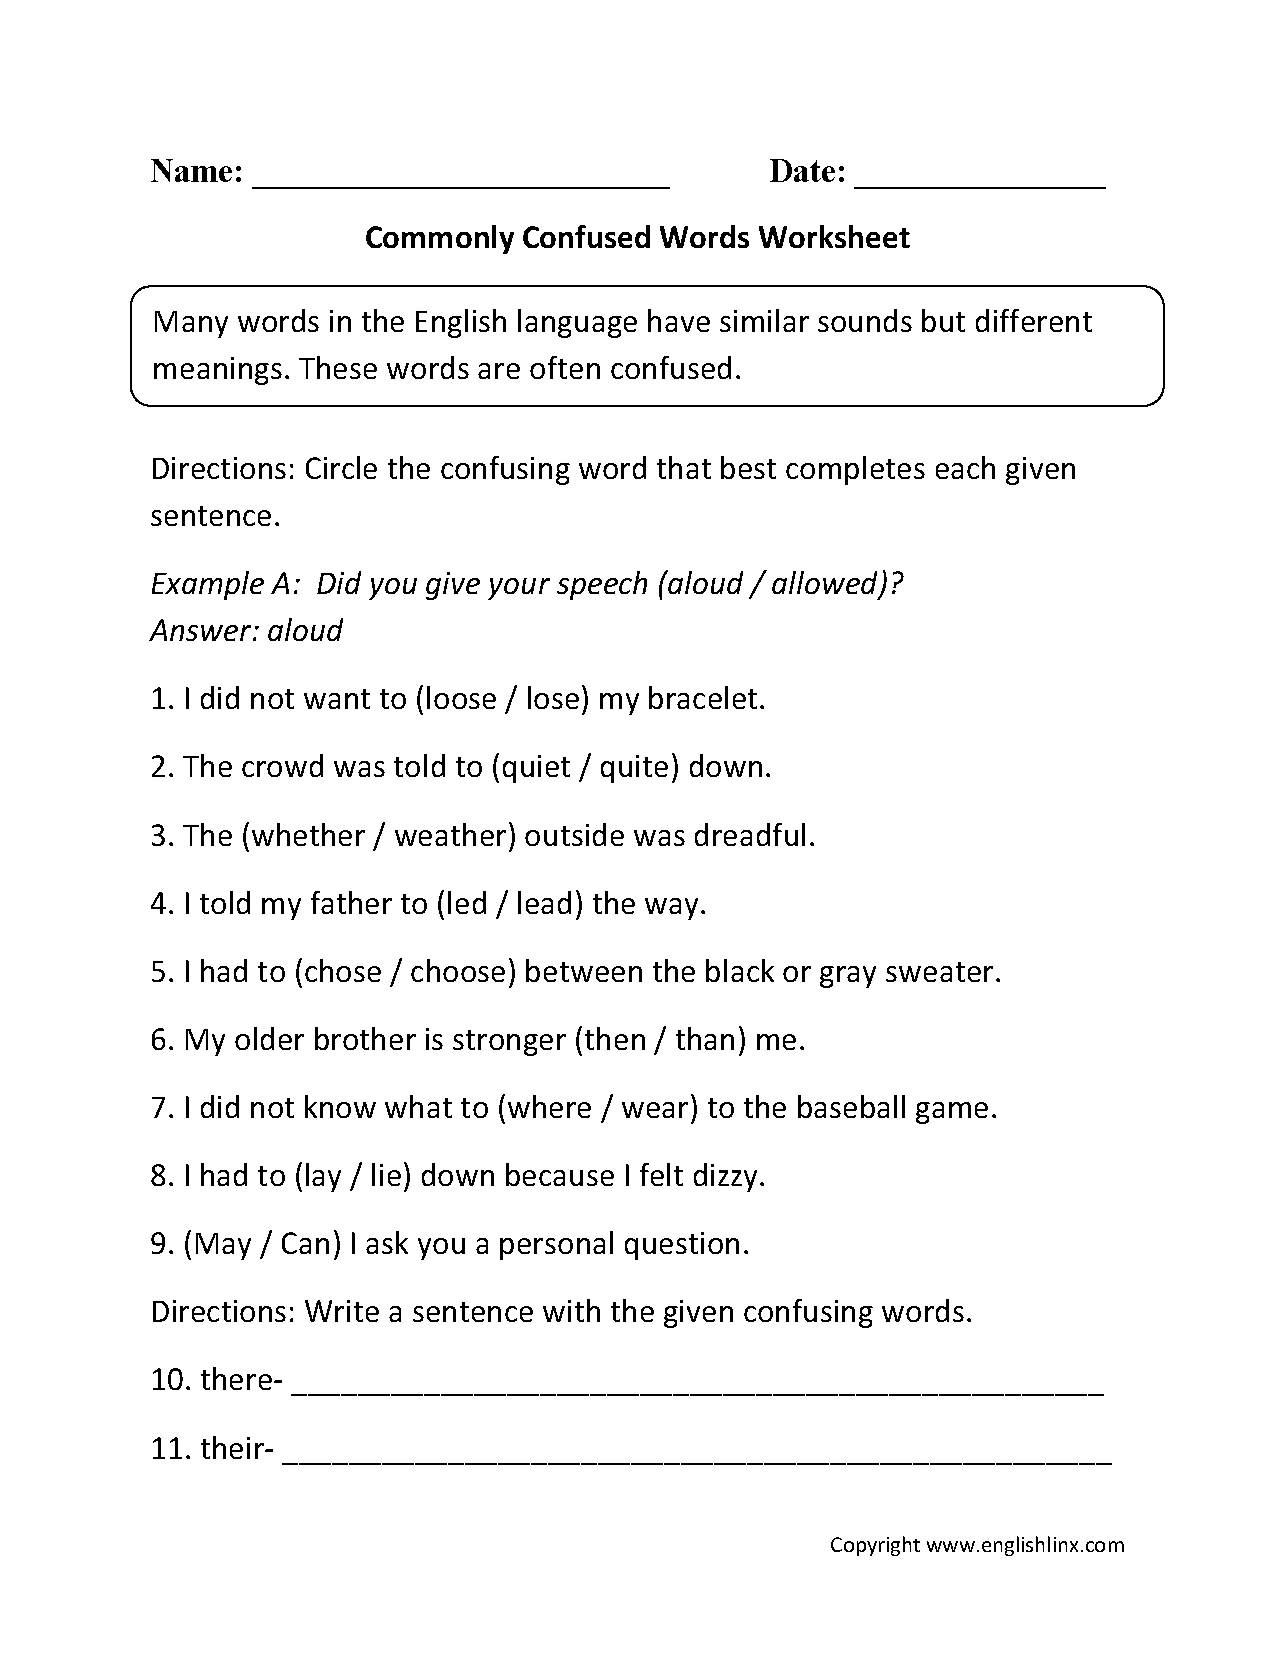 medium resolution of Grammar Worksheets   Word Usage Worksheets   Commonly confused words